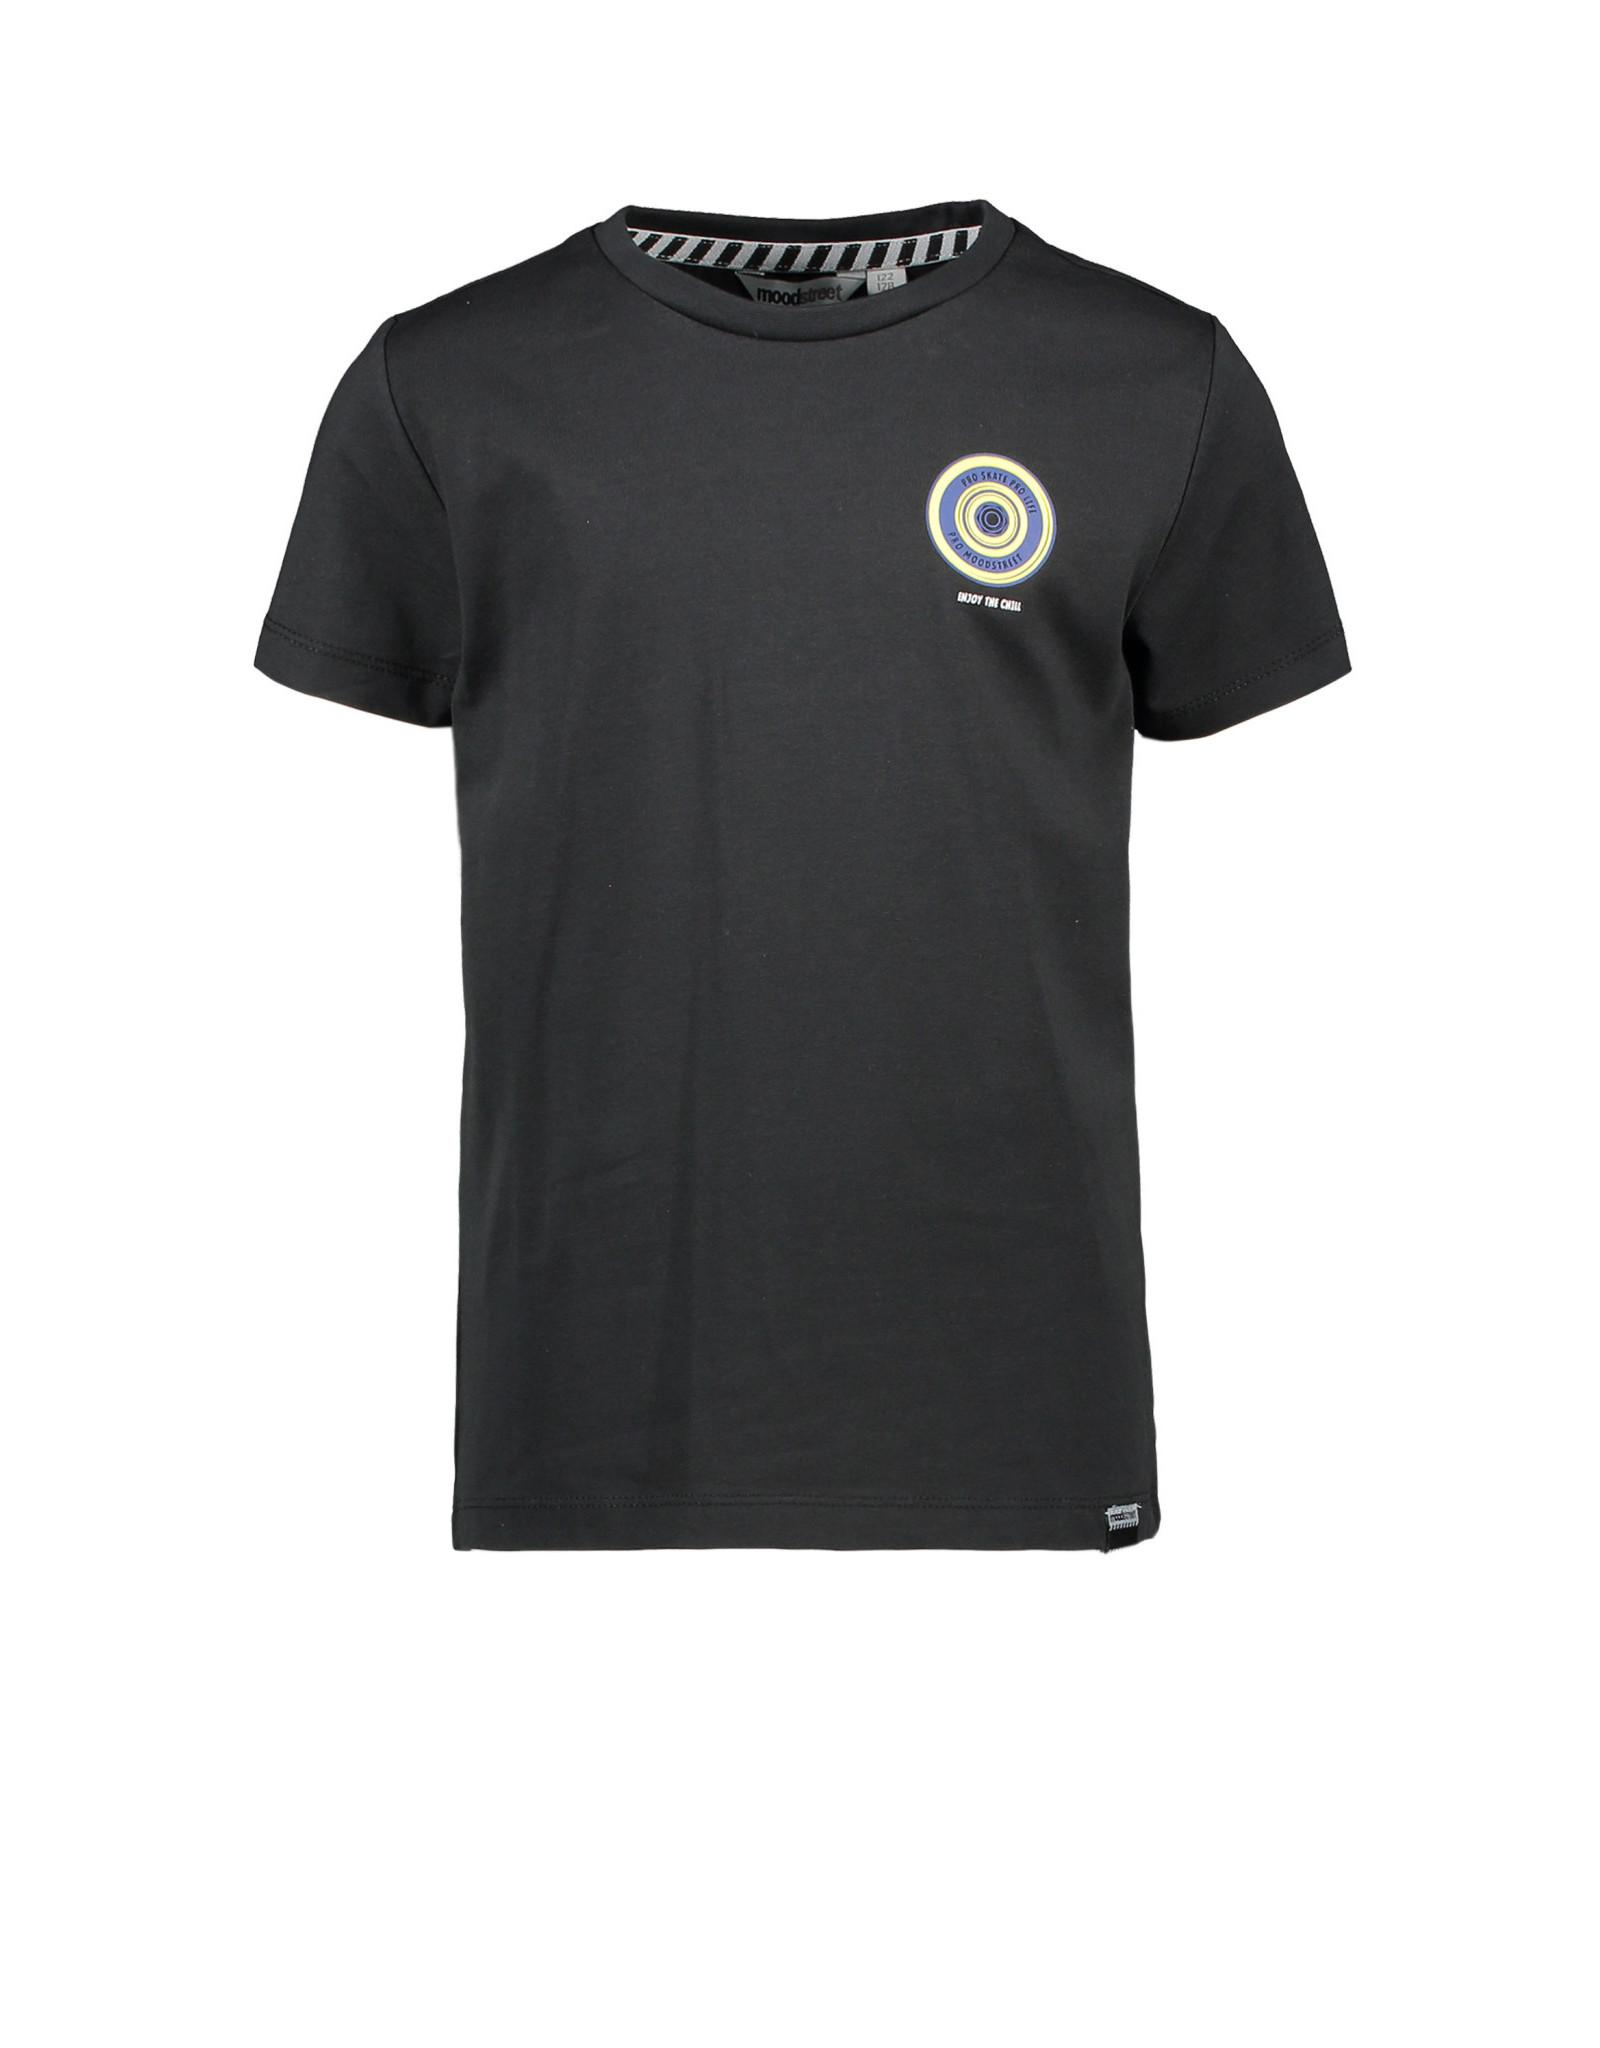 Moodstreet Moodstreet jongens t-shirt Black Back Print